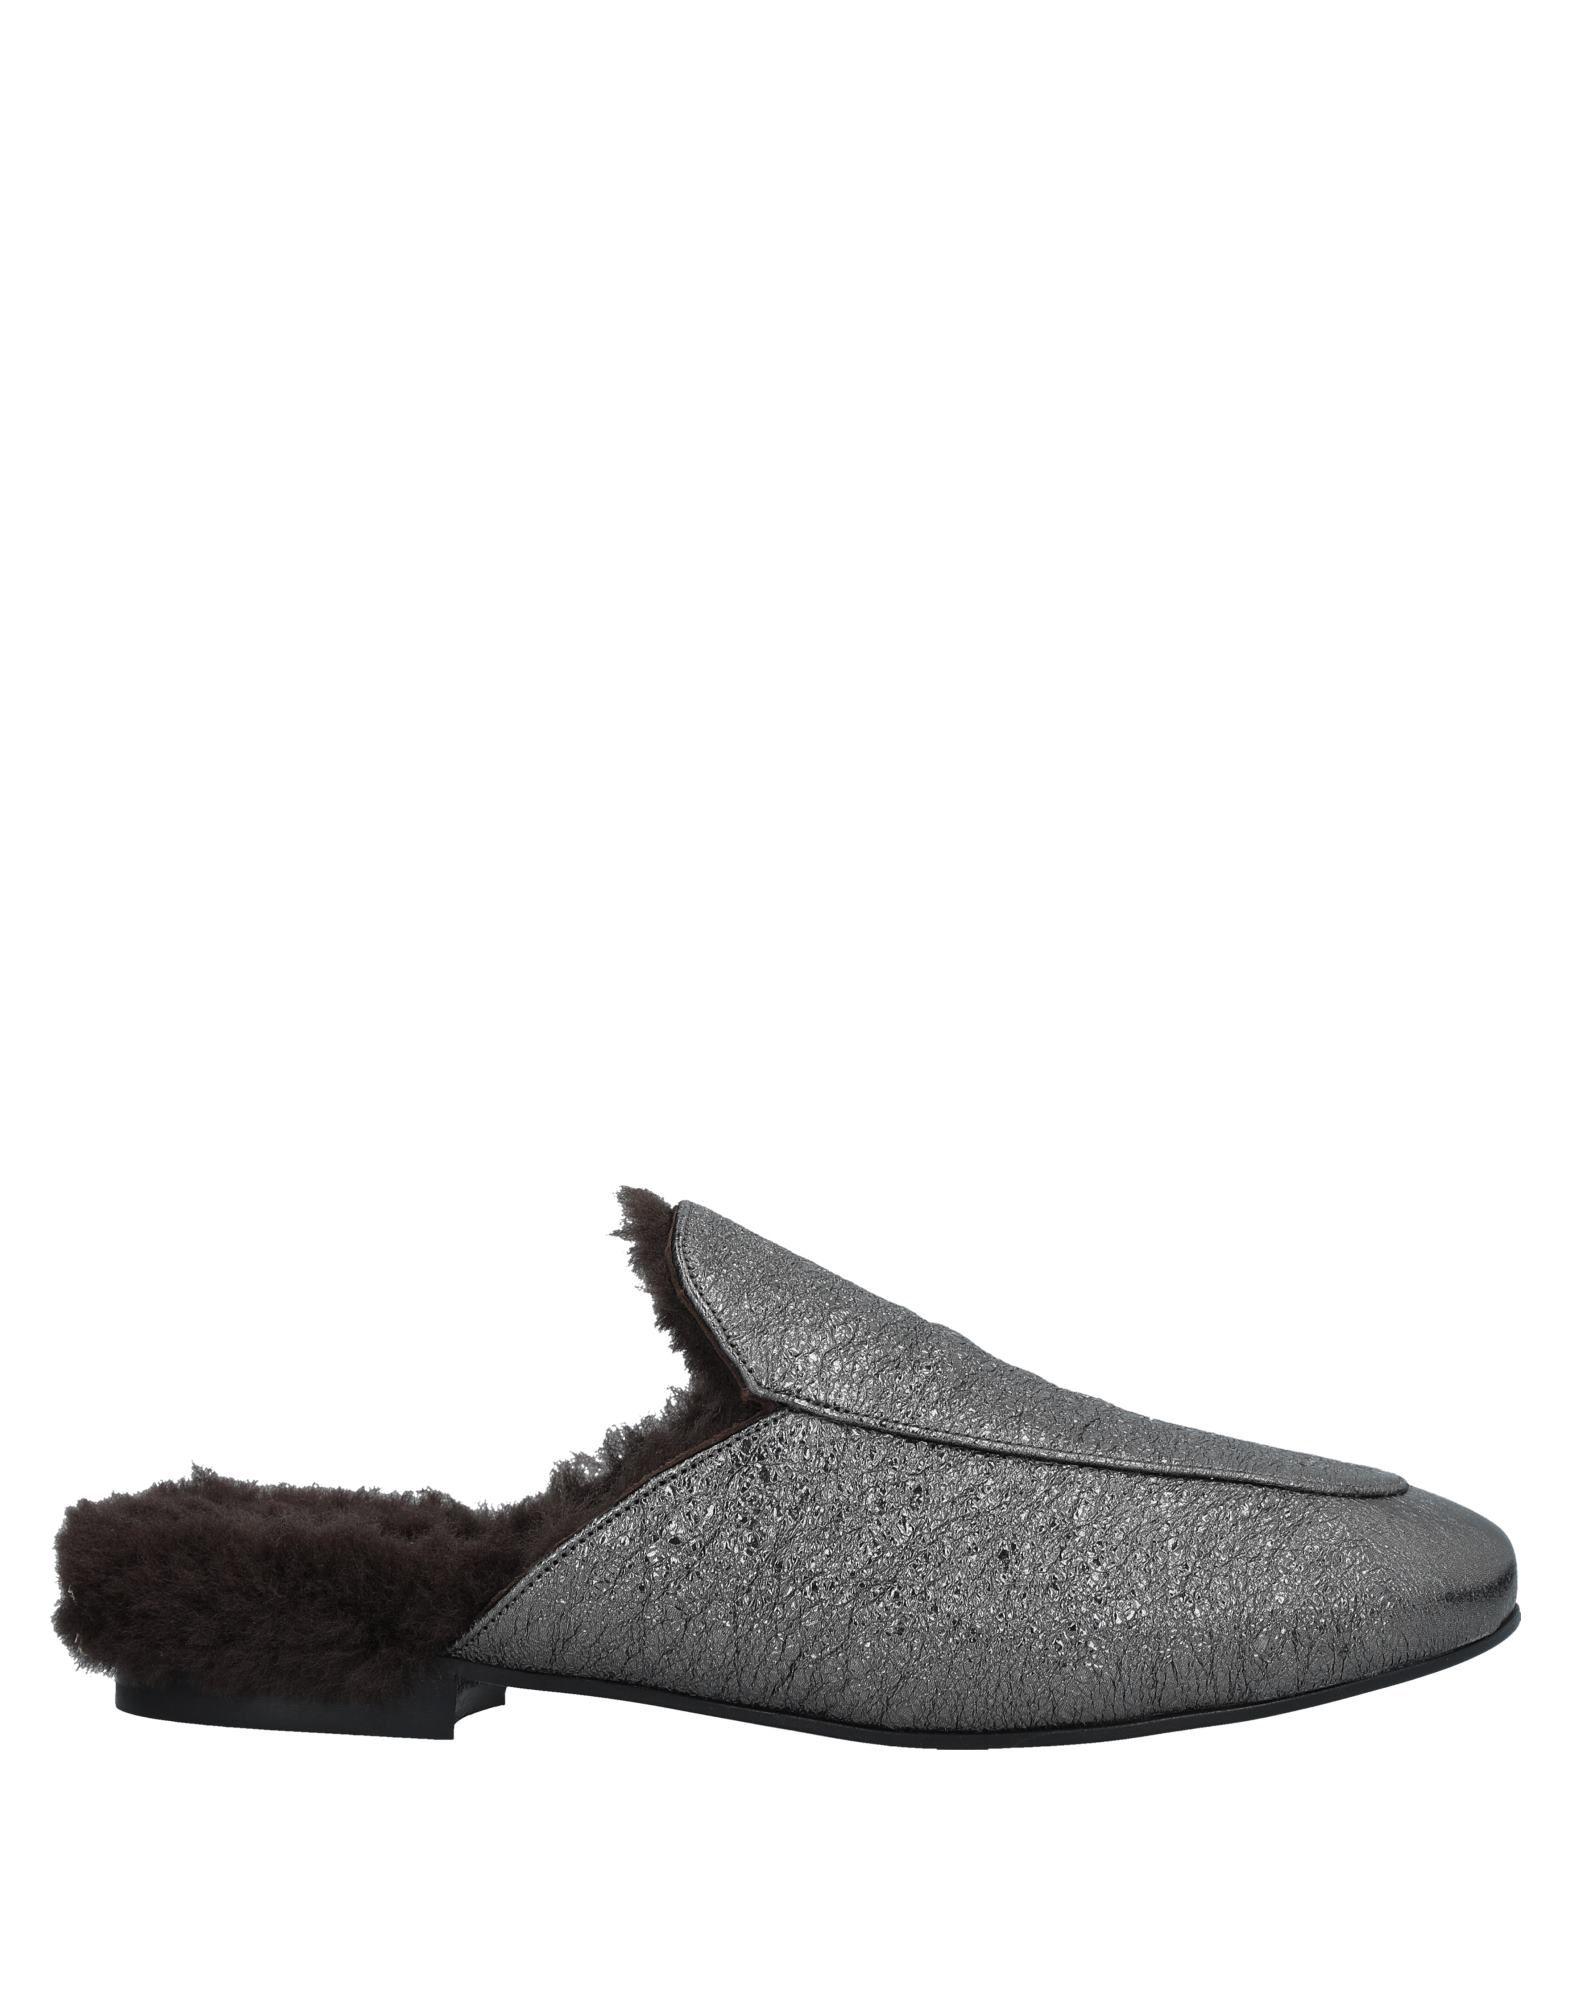 Stilvolle Stilvolle Stilvolle billige Schuhe Emanuela Caruso Capri Pantoletten Damen  11529292RX 9b0ba9